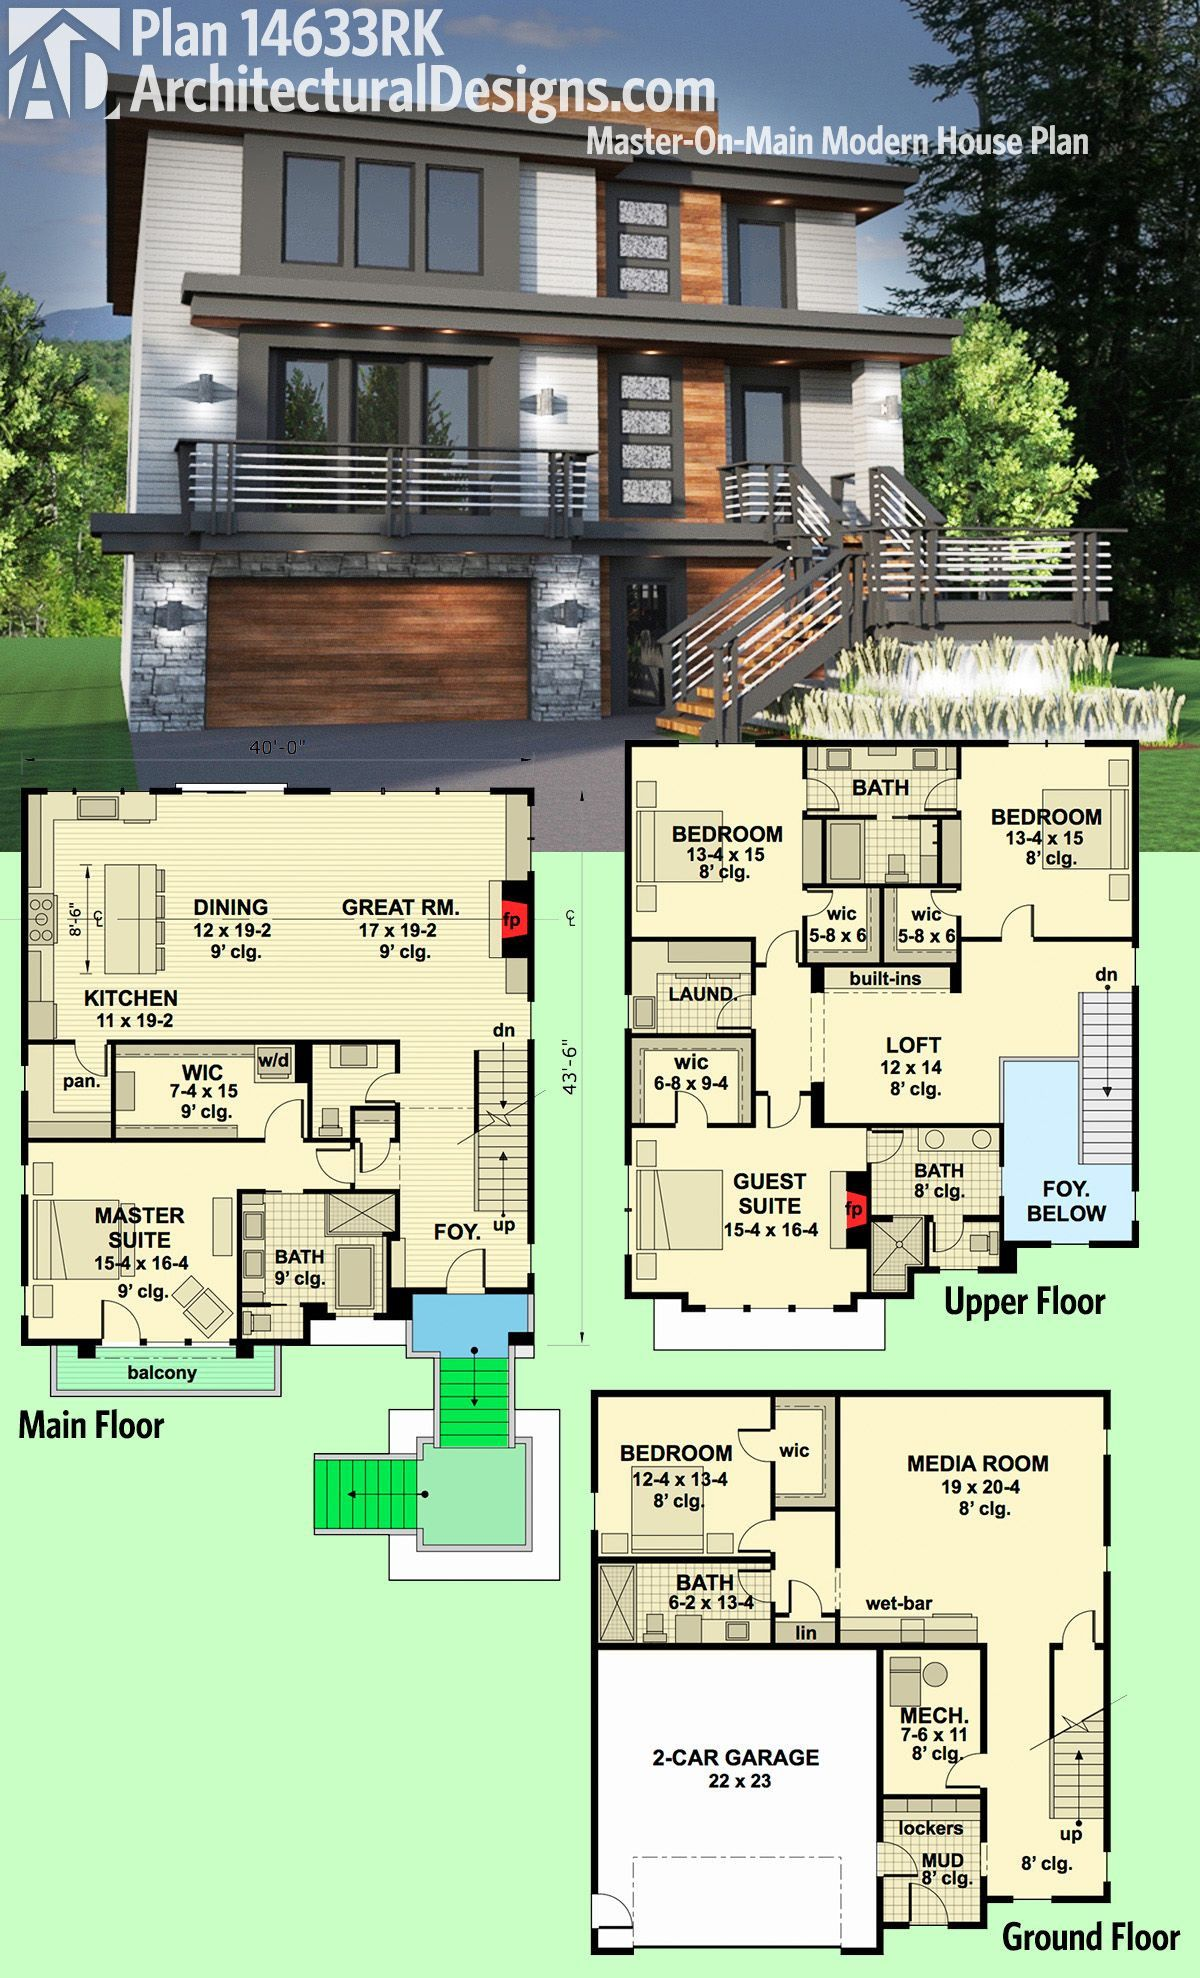 2 Storey House Plans Philippines With Blueprint Fresh Plan Rk Master Main Modern House Plan Pinterest House Blueprints Modern House Plan House Plans